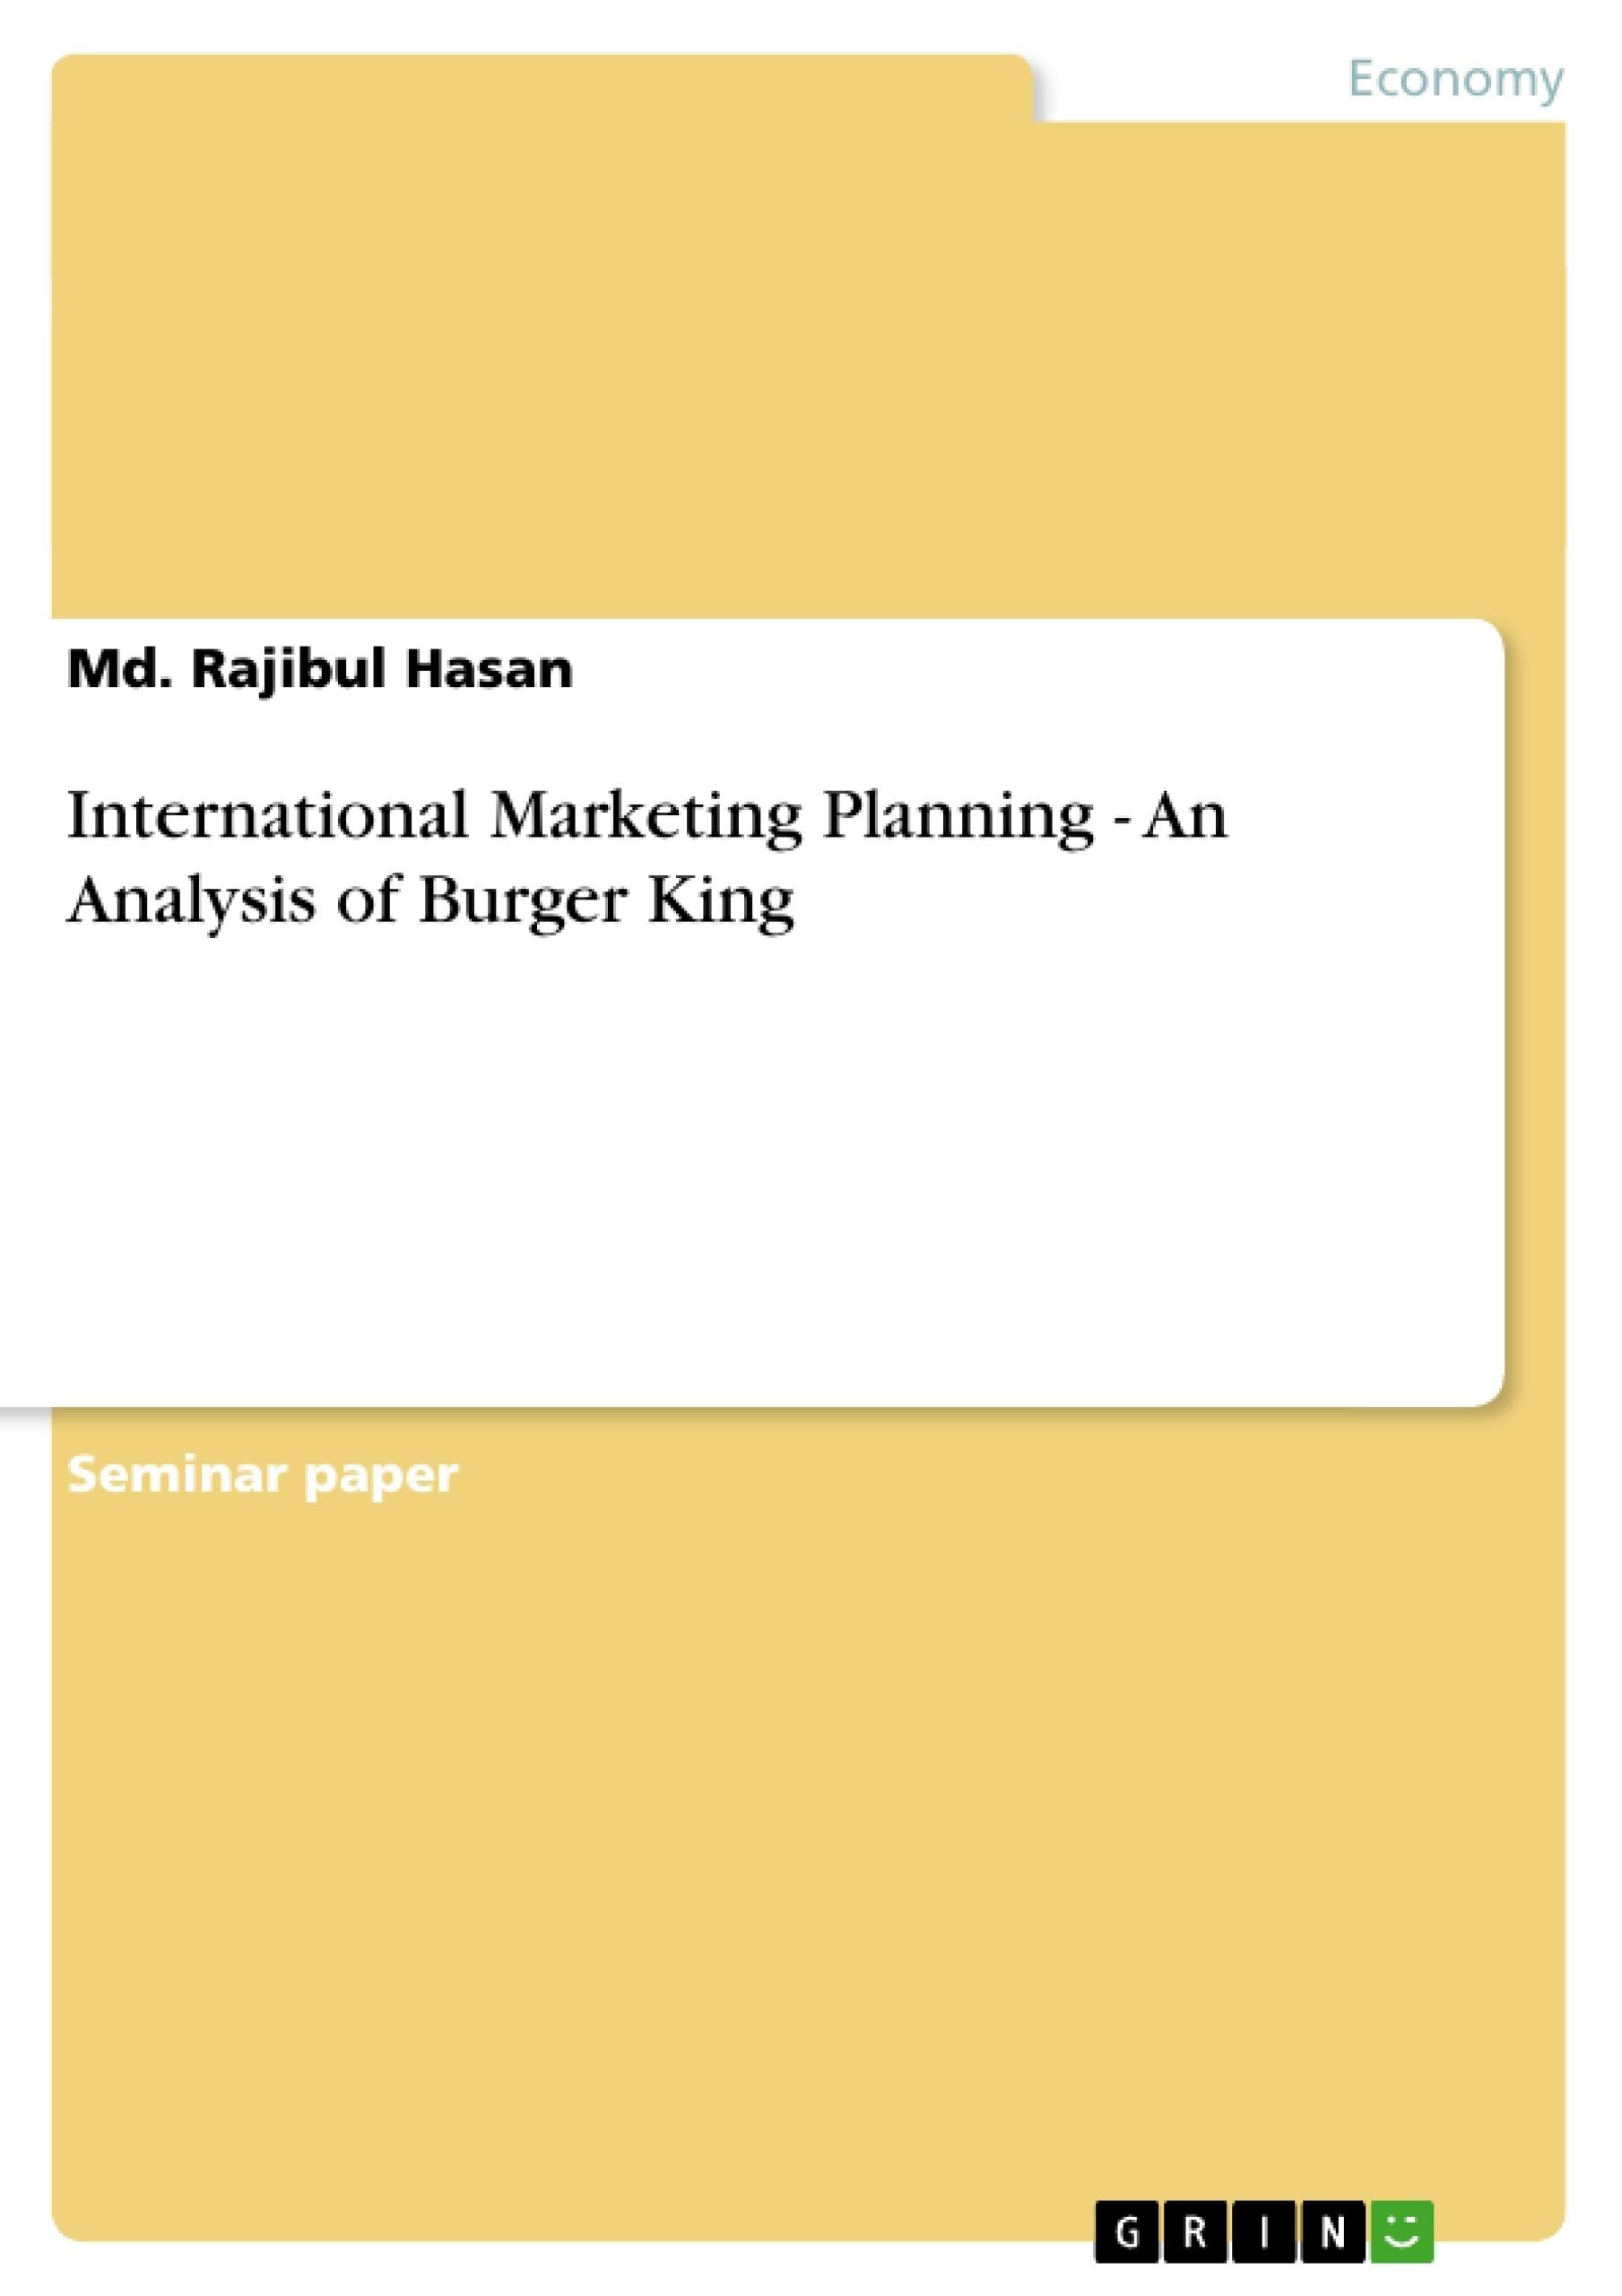 Title: International Marketing Planning - An Analysis of Burger King